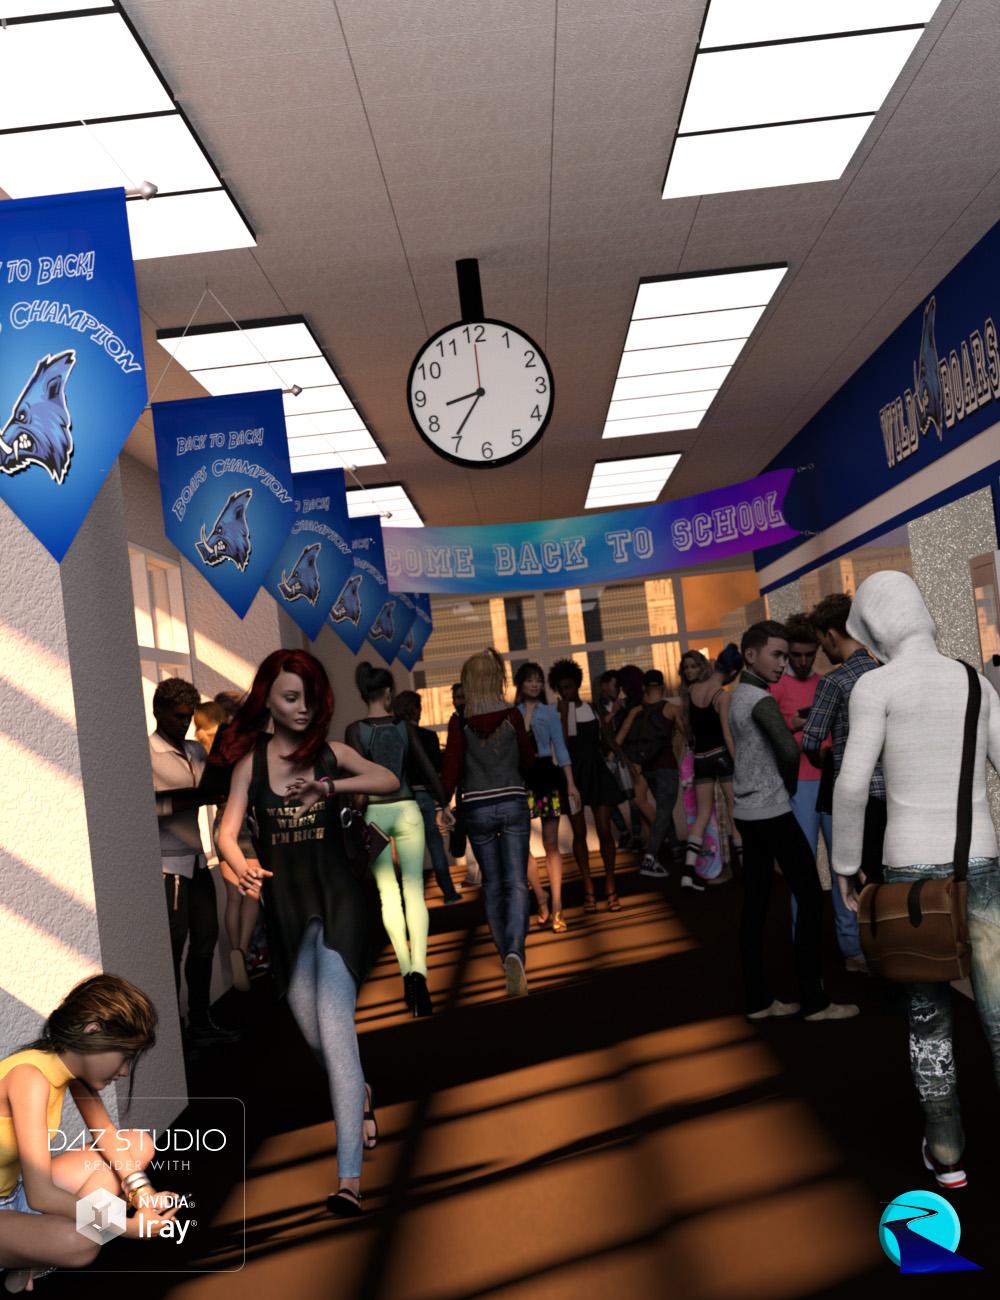 Now-Crowd Billboards - School Life by: RiverSoft Art, 3D Models by Daz 3D